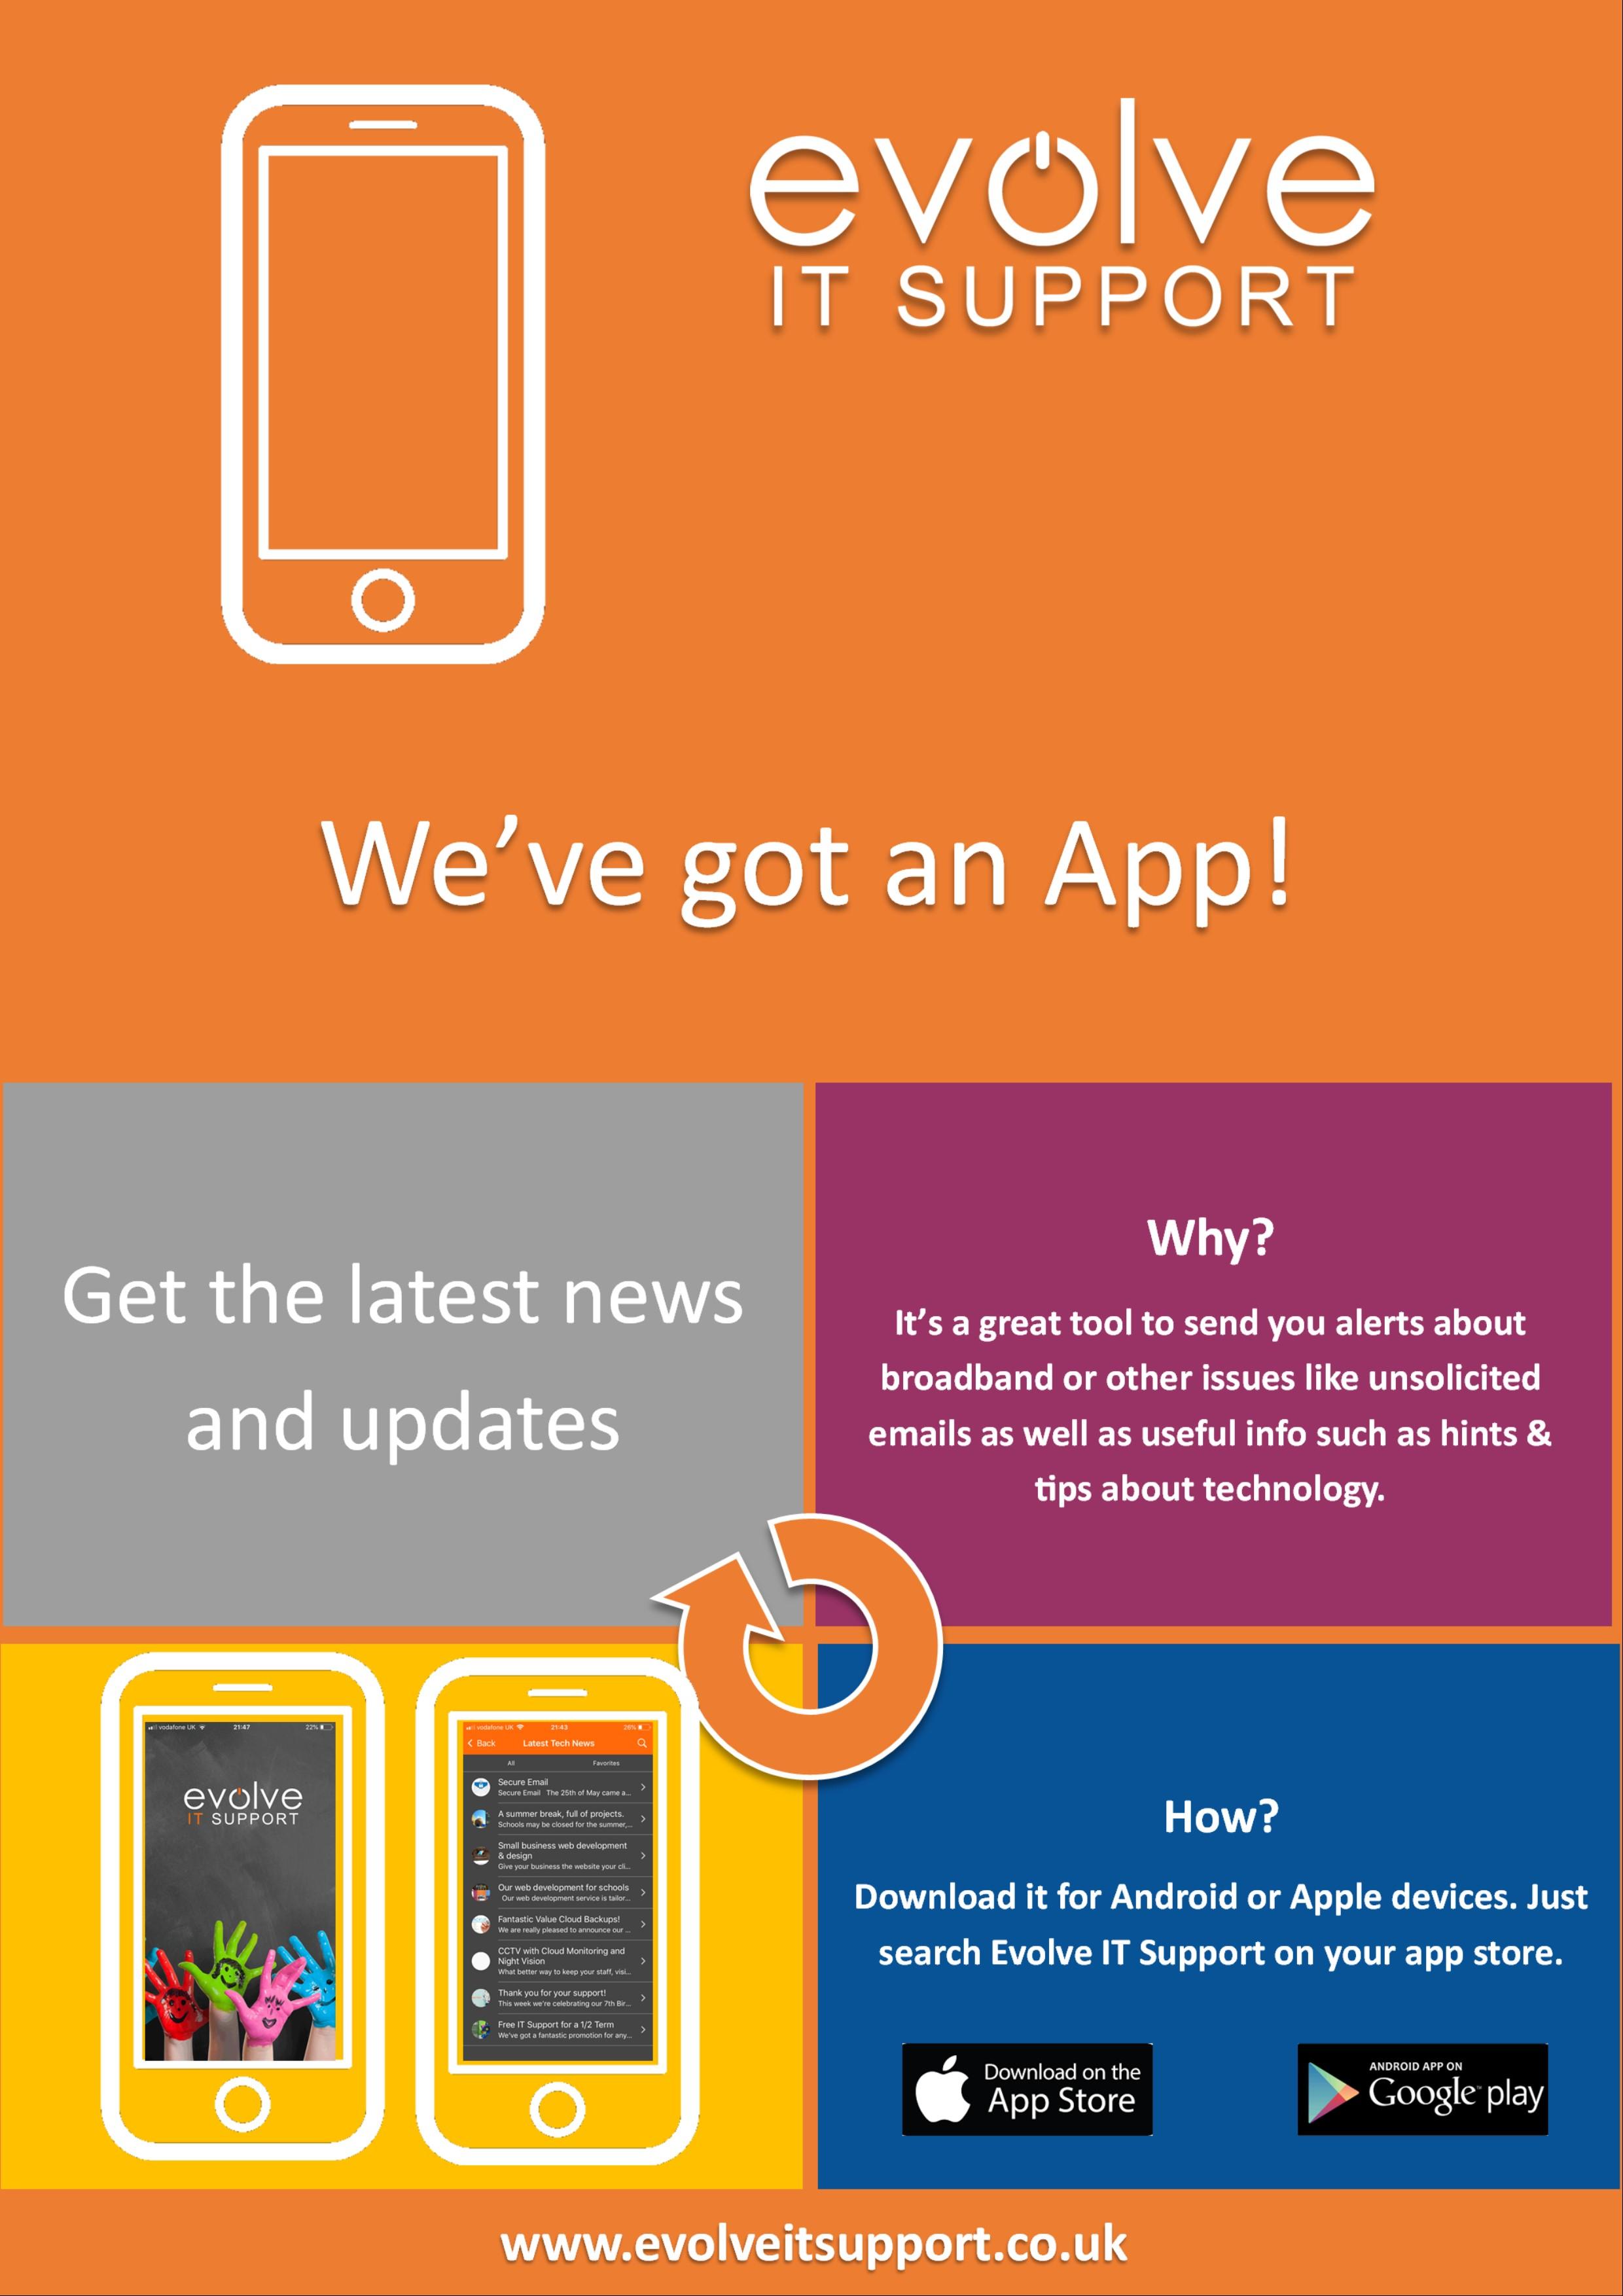 evolve it support customer app